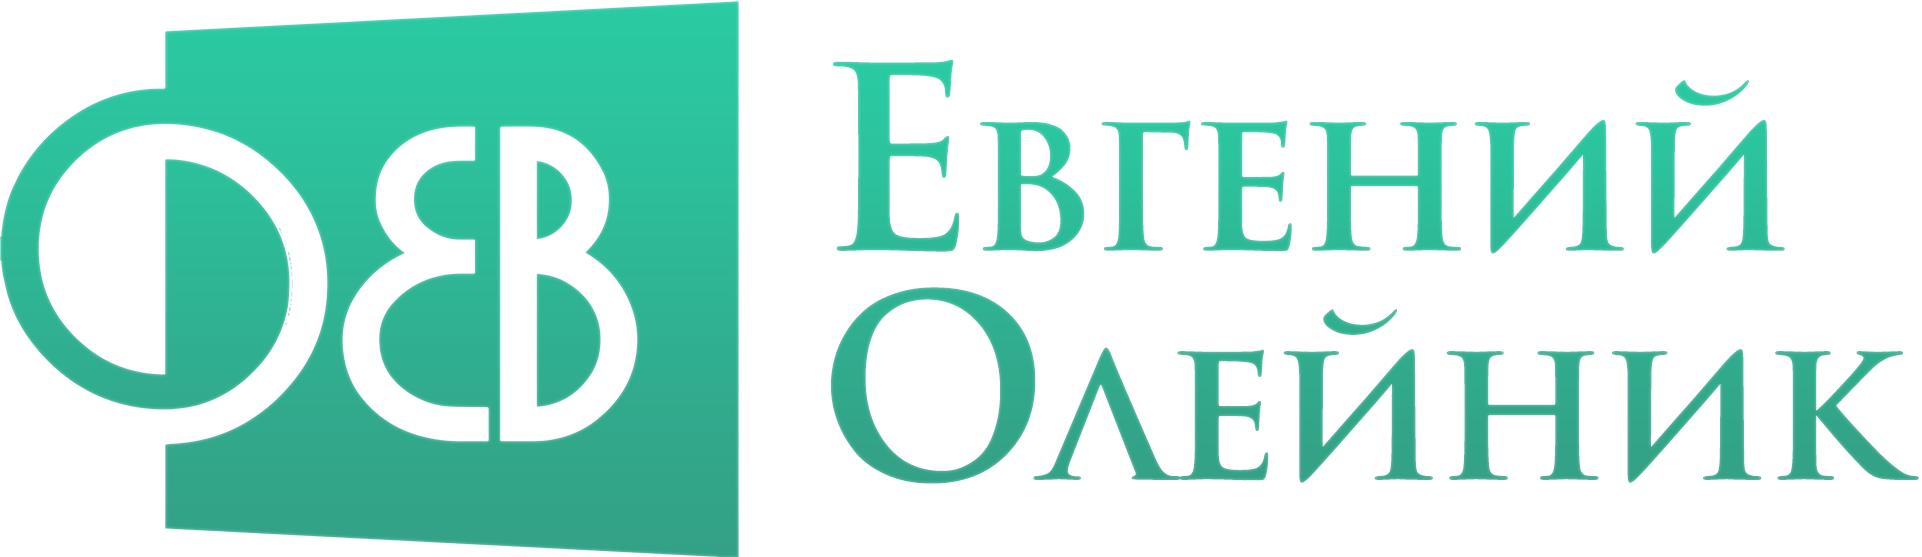 Пластический хирург Евгений Олейник